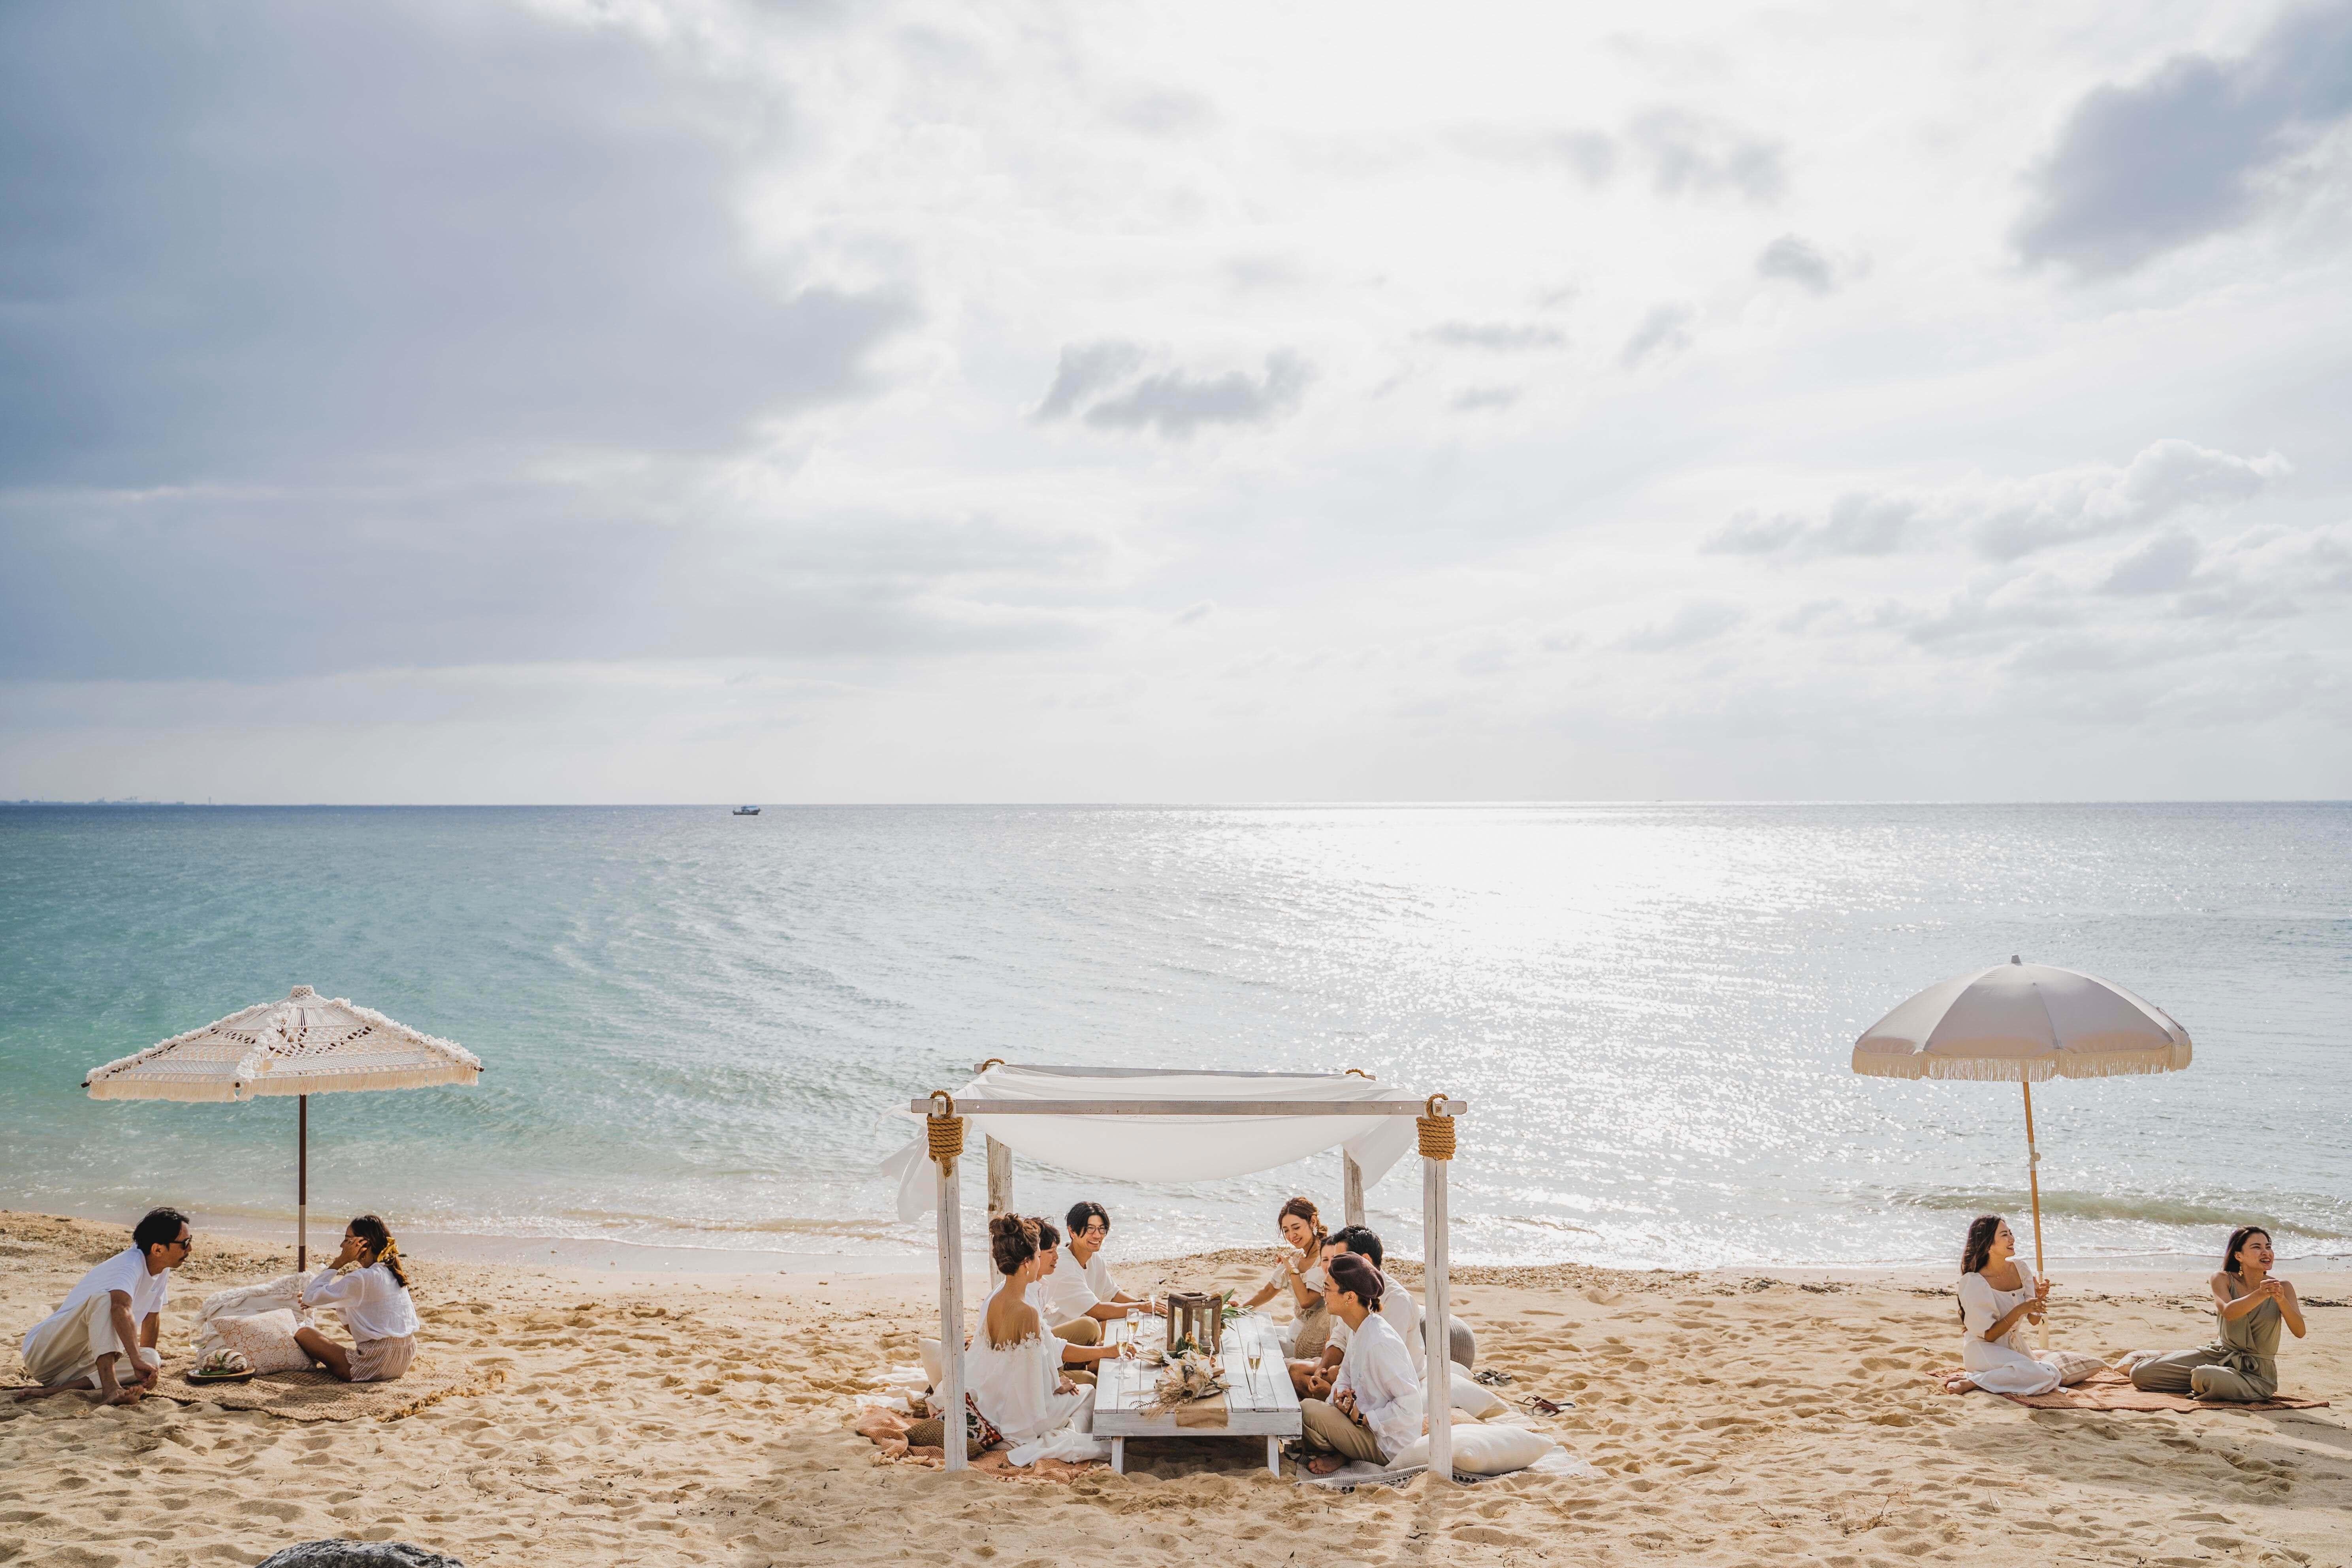 BRAPLA 吉田 美江 by P-style weddingの画像1